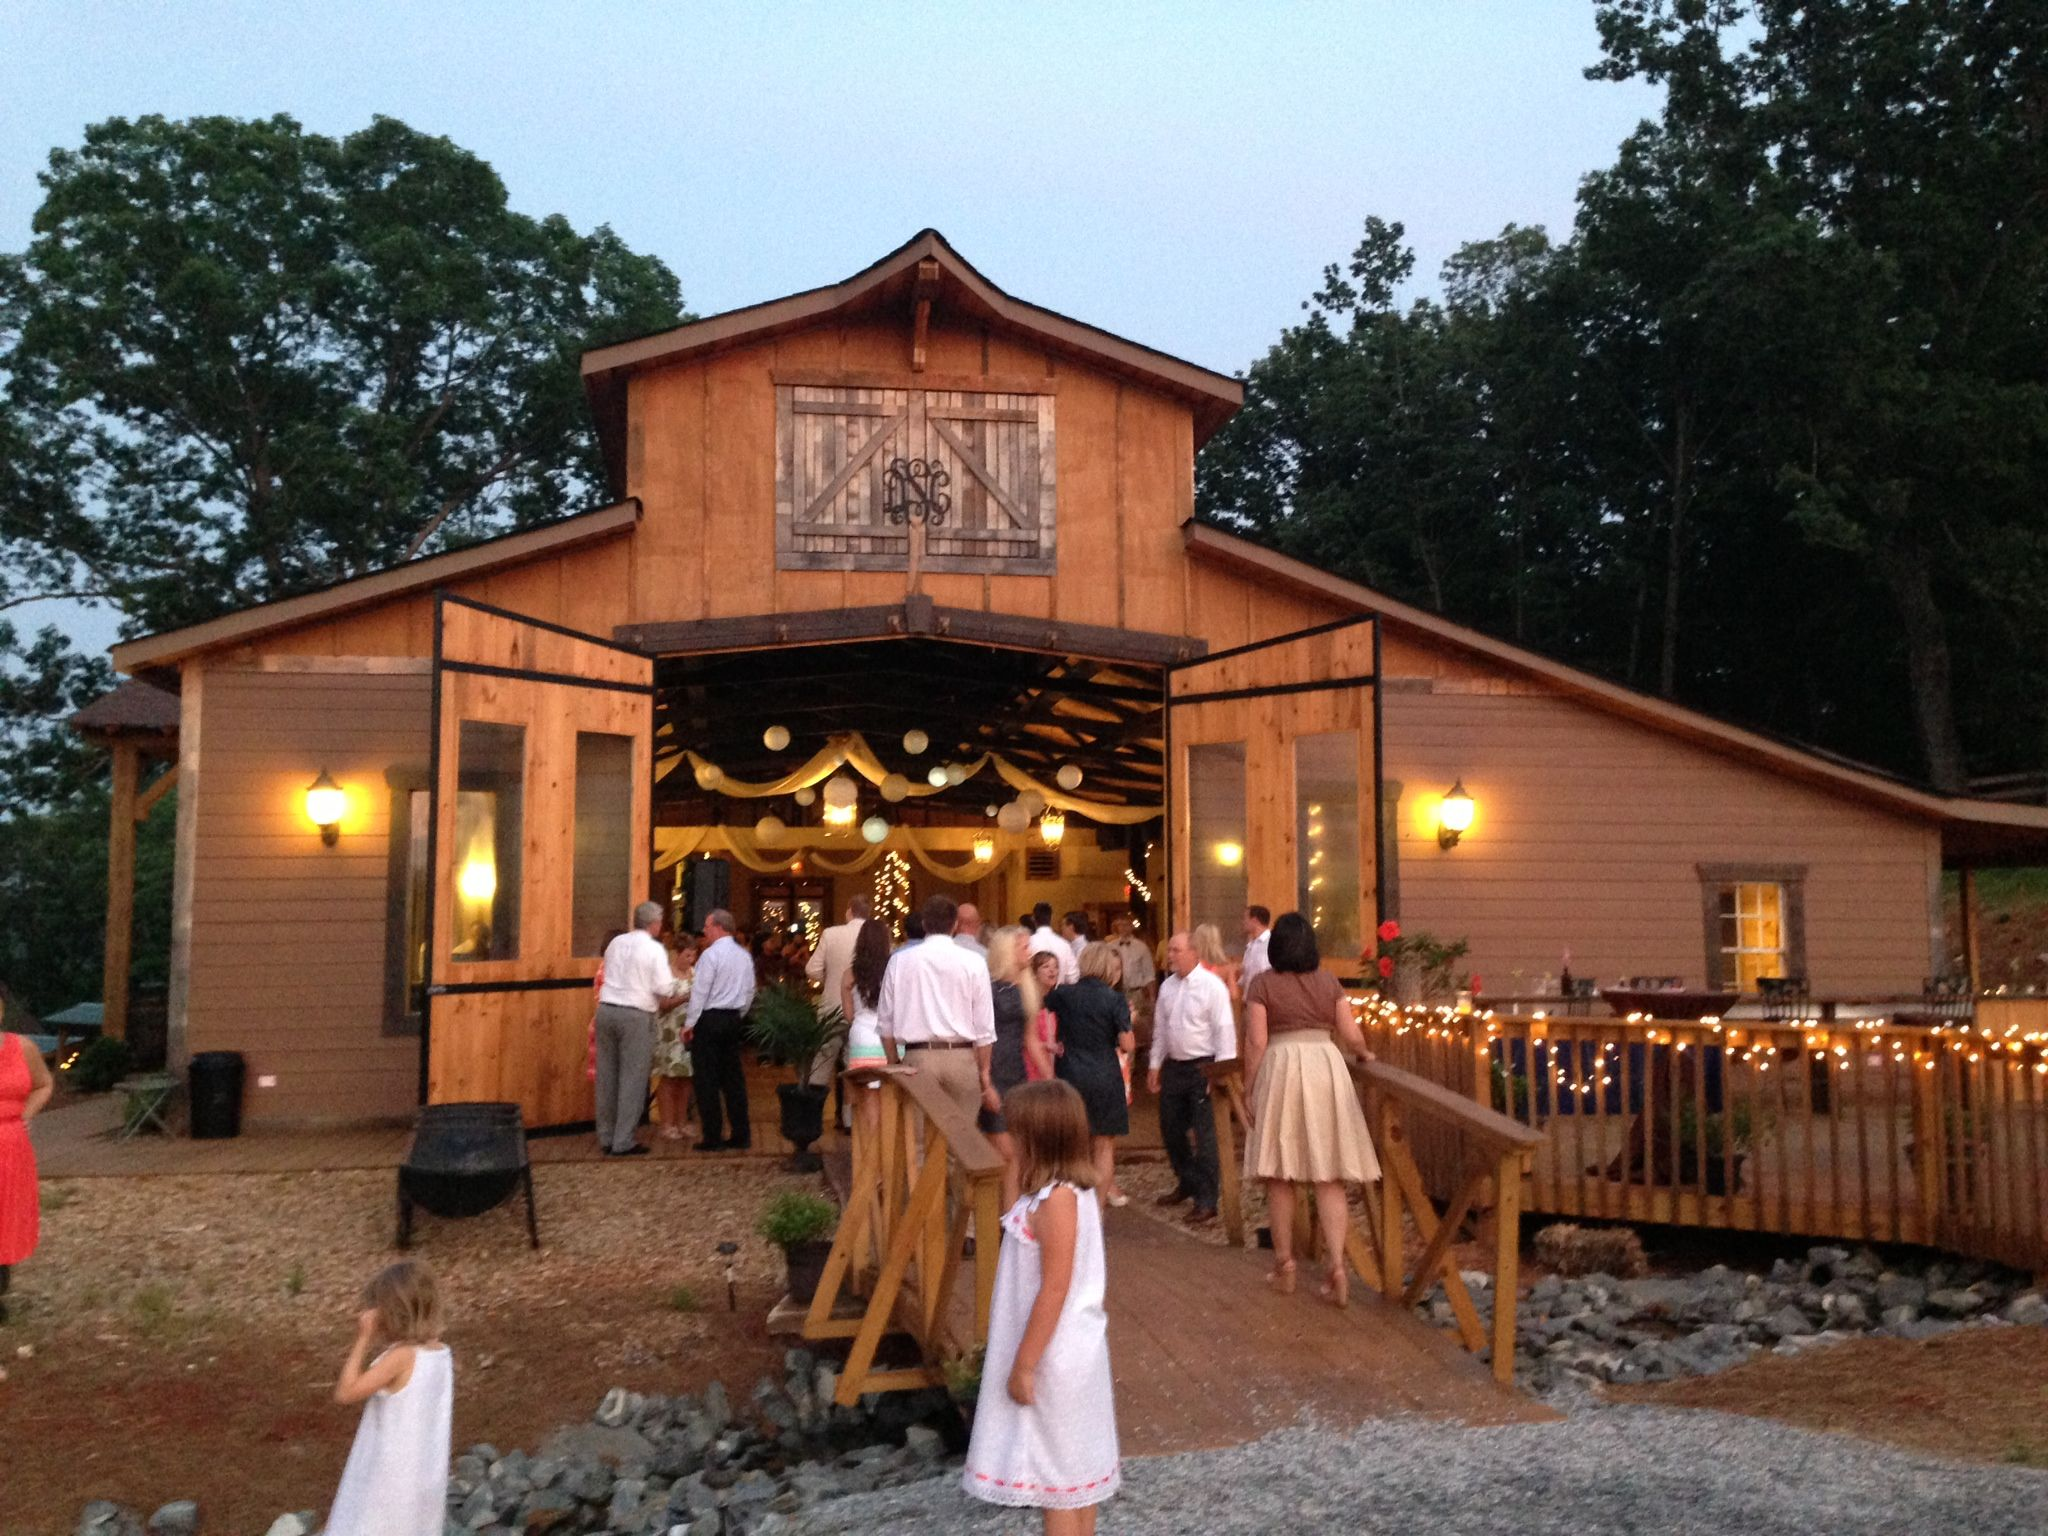 White Oaks Barn Reception, Dahlonega, GA Barn reception